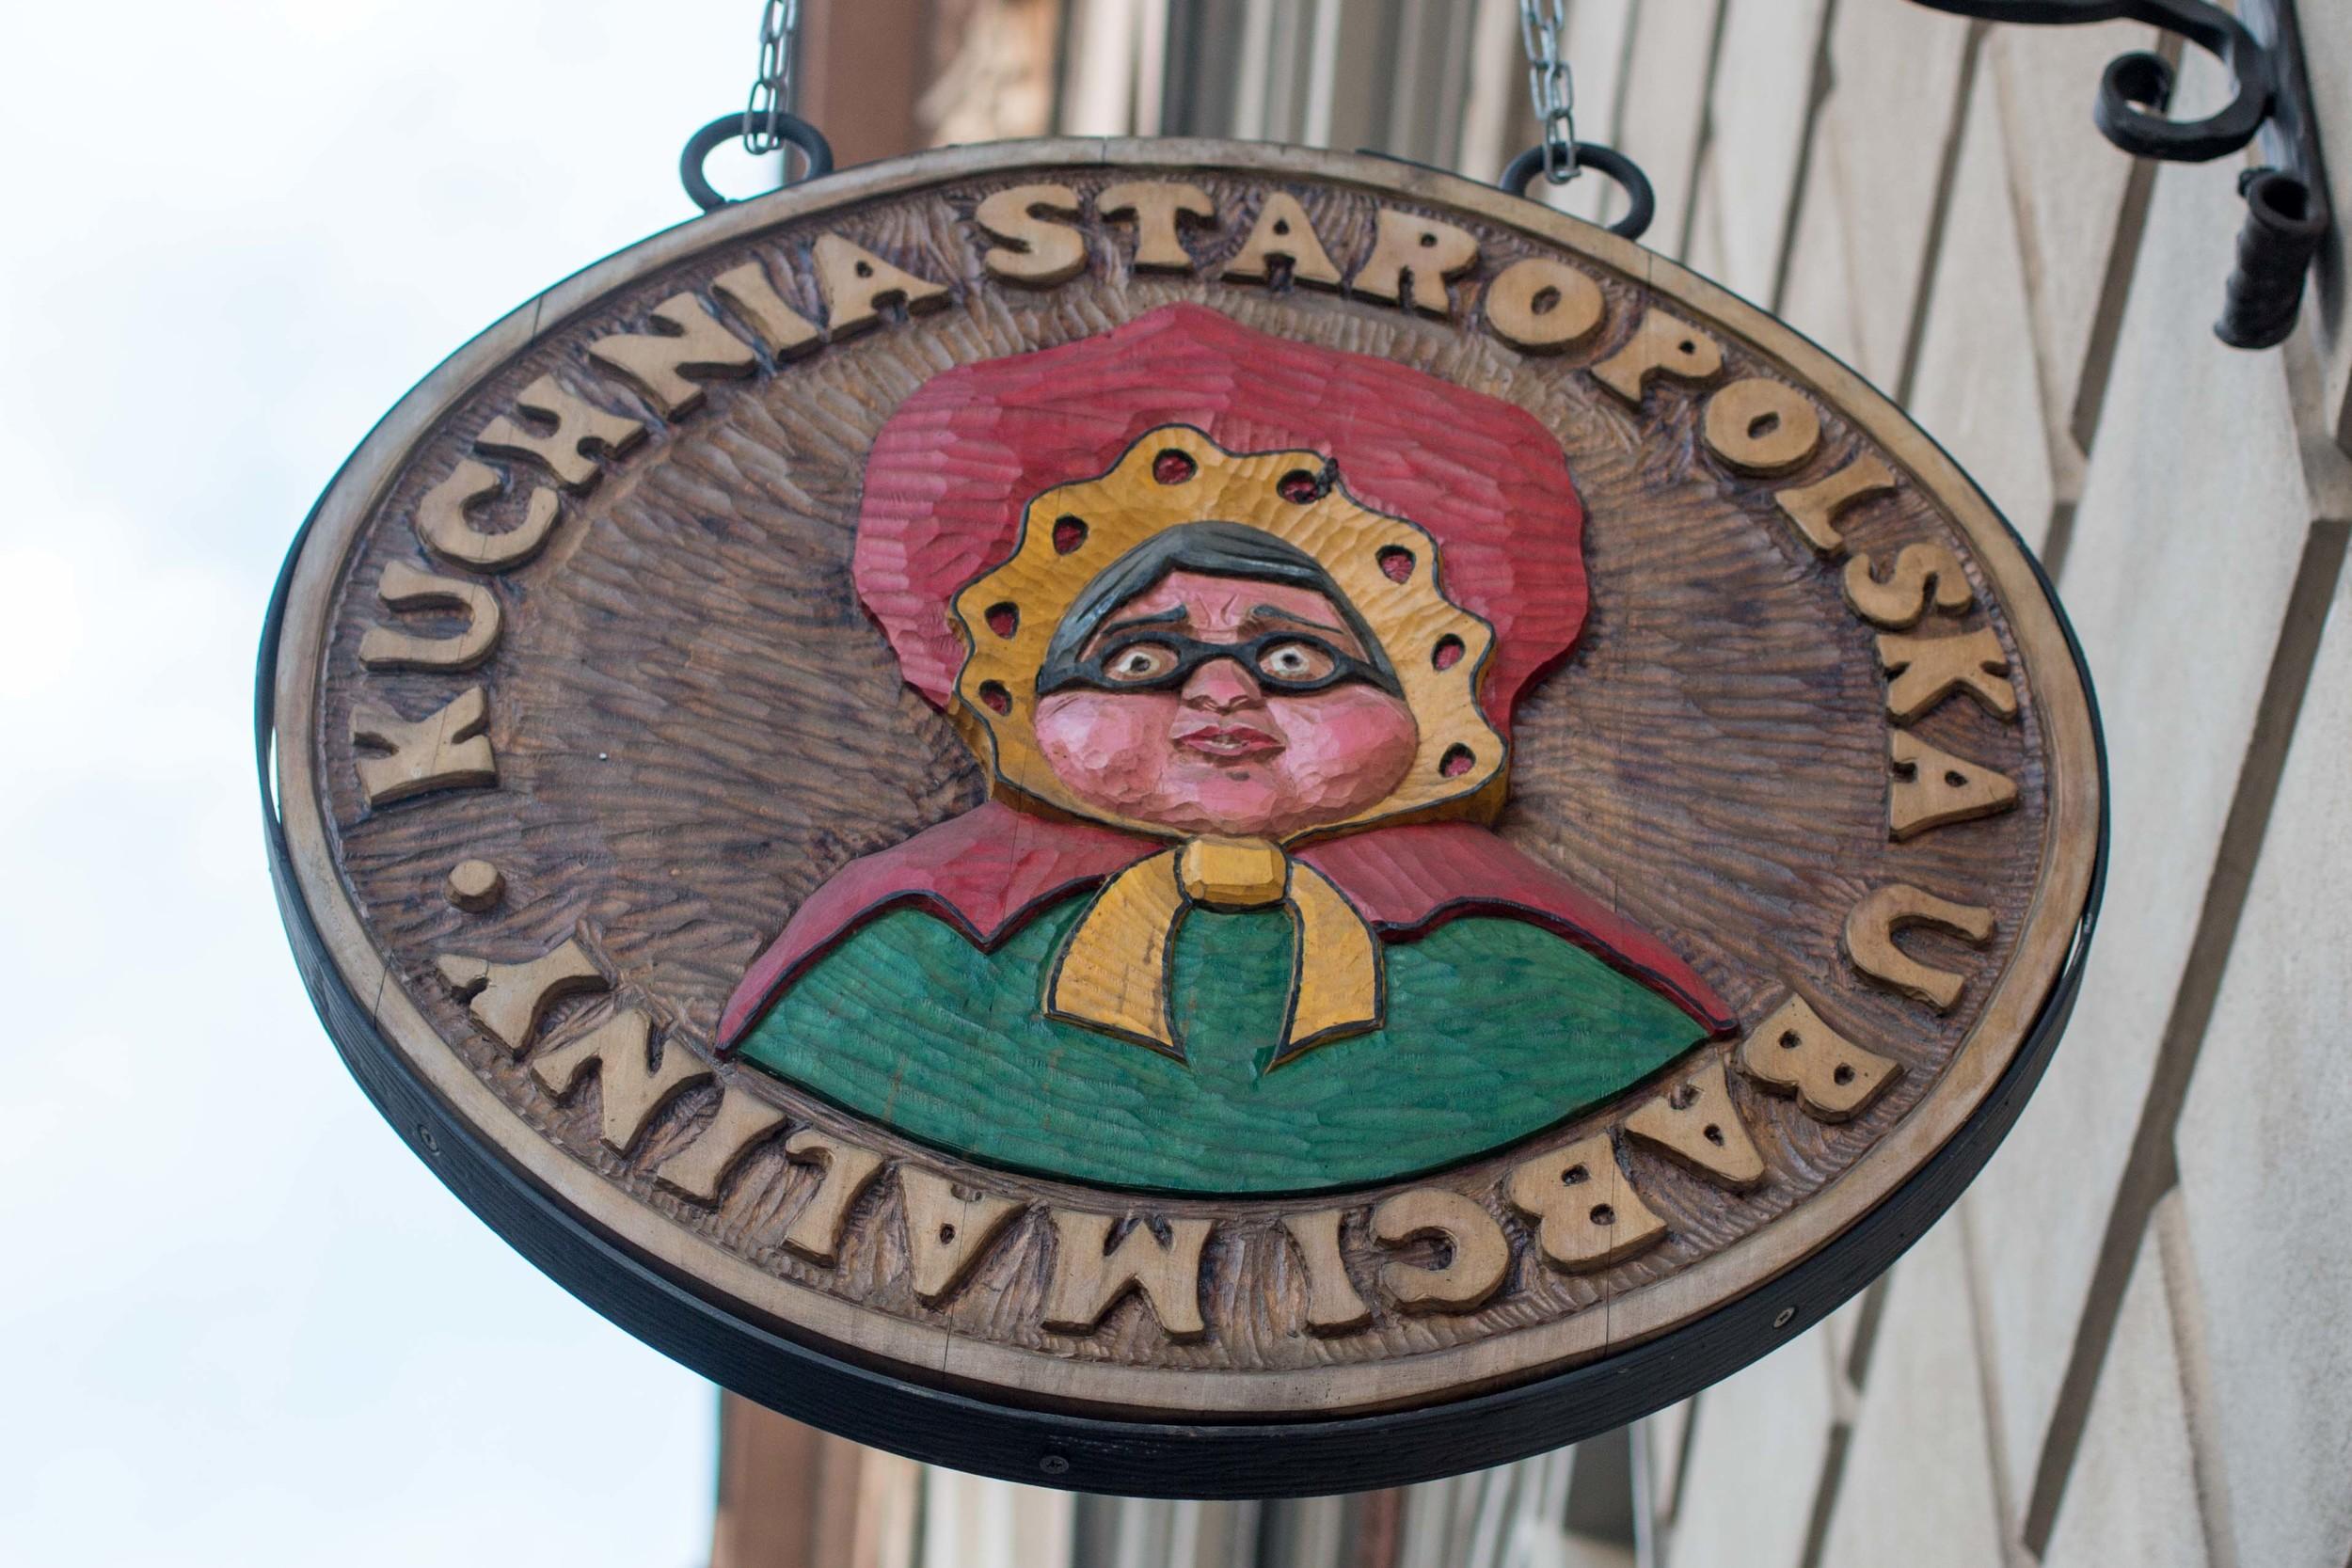 U Babci Maliny - Like Grandma's Kitchen. Tasty Polish restaurant in the Old Town